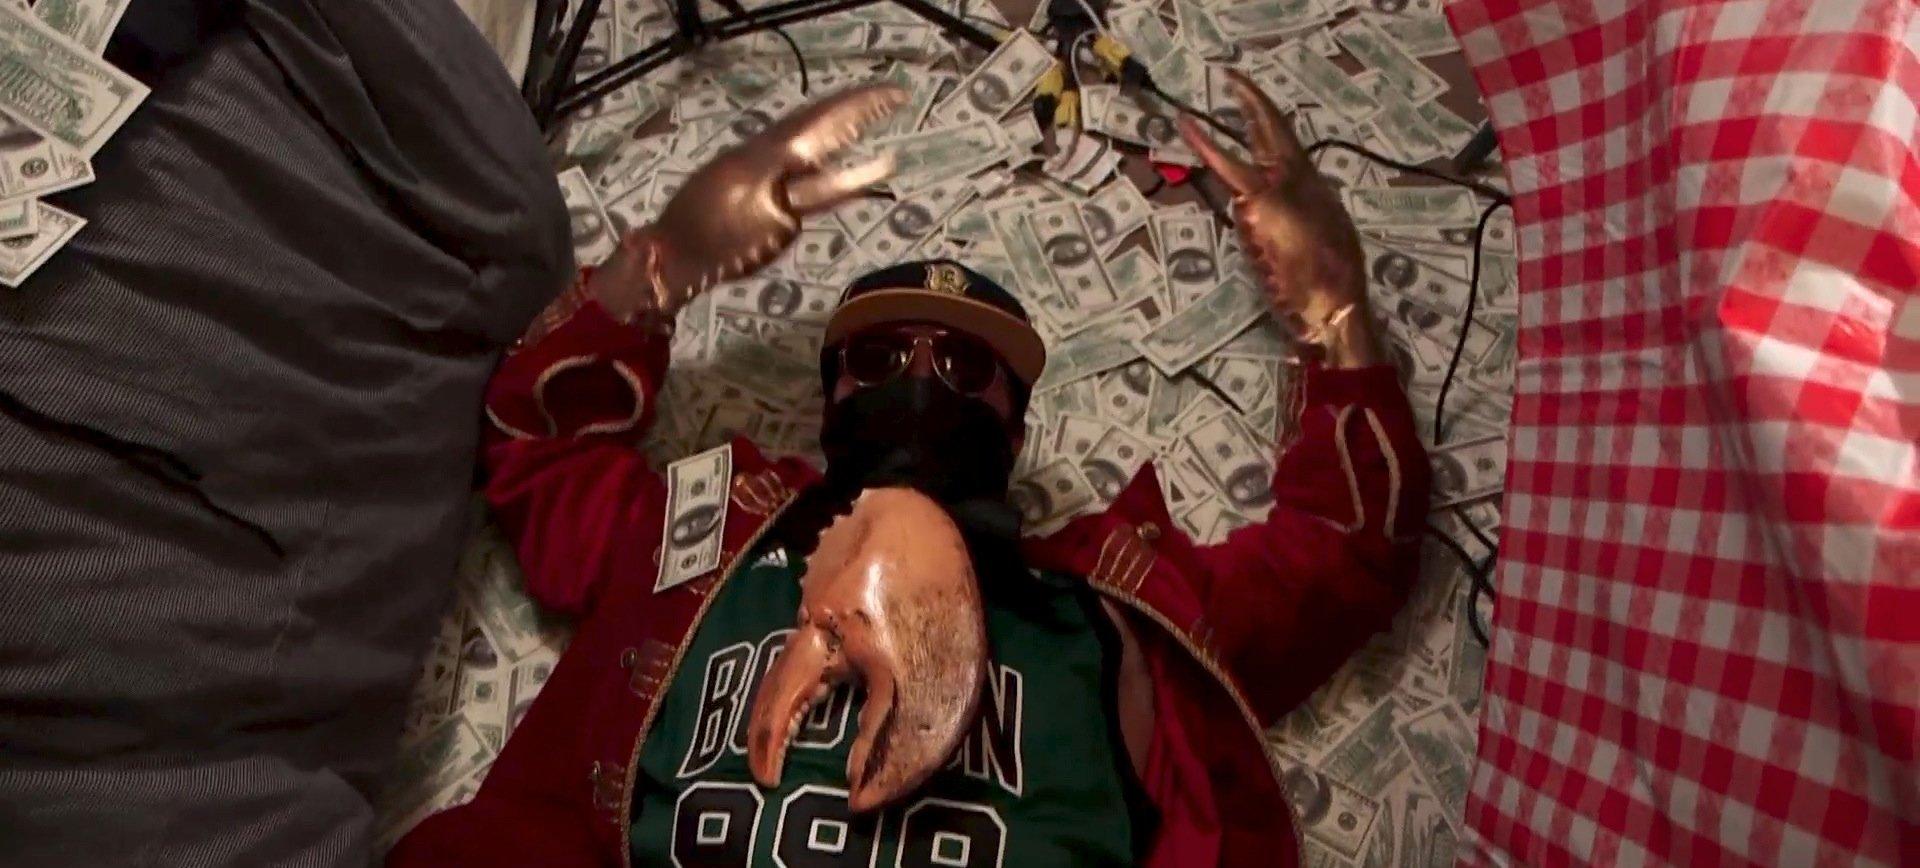 Dr. Klaw, NYC\'s Illegal Underground Lobster Roll Dealer, Gets Back Into Business